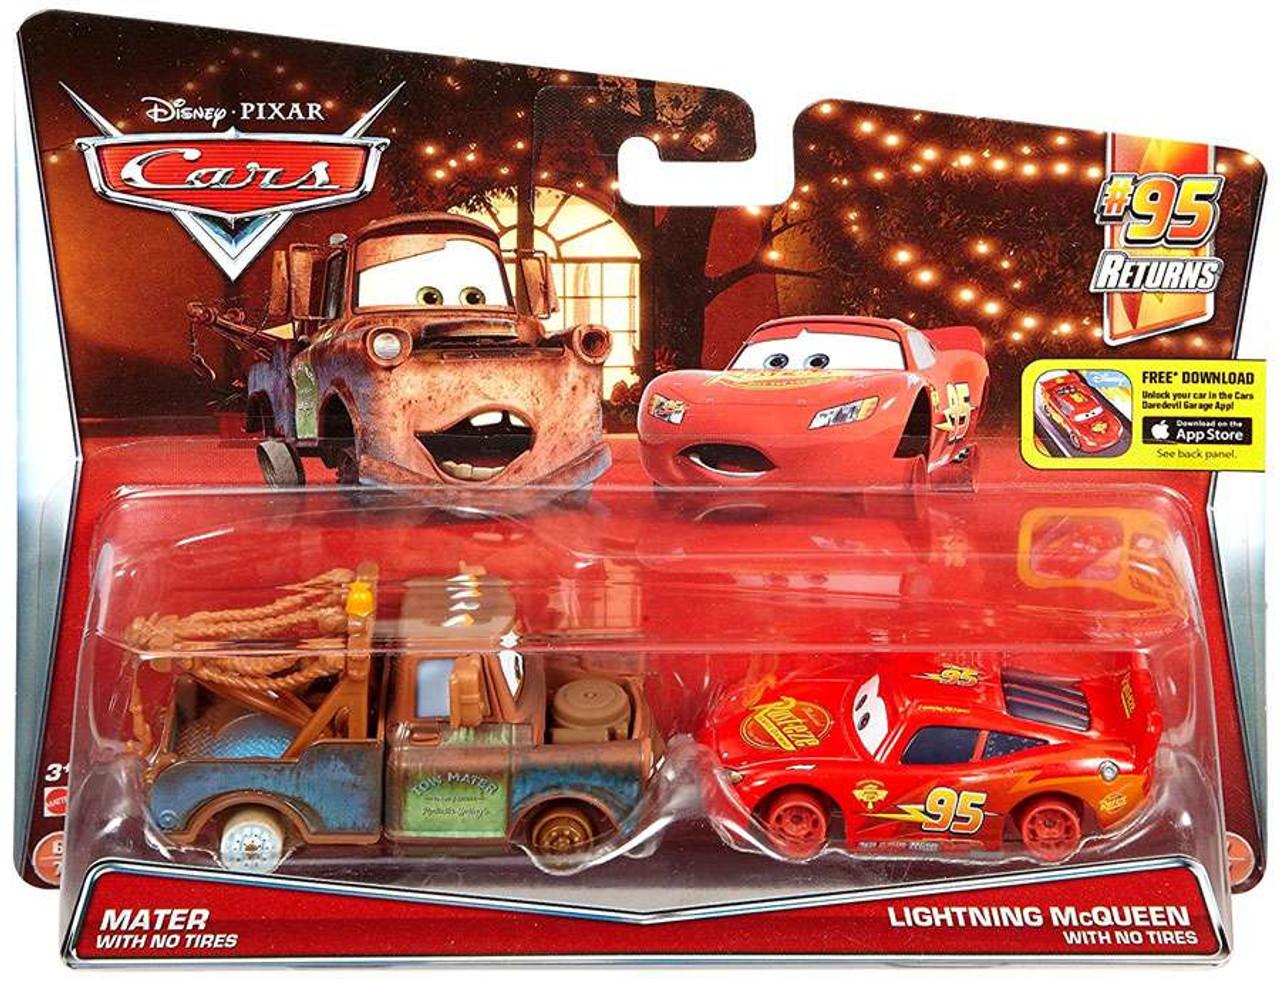 Disney Pixar Cars 95 Returns Mater With No Tires Lightning Mcqueen